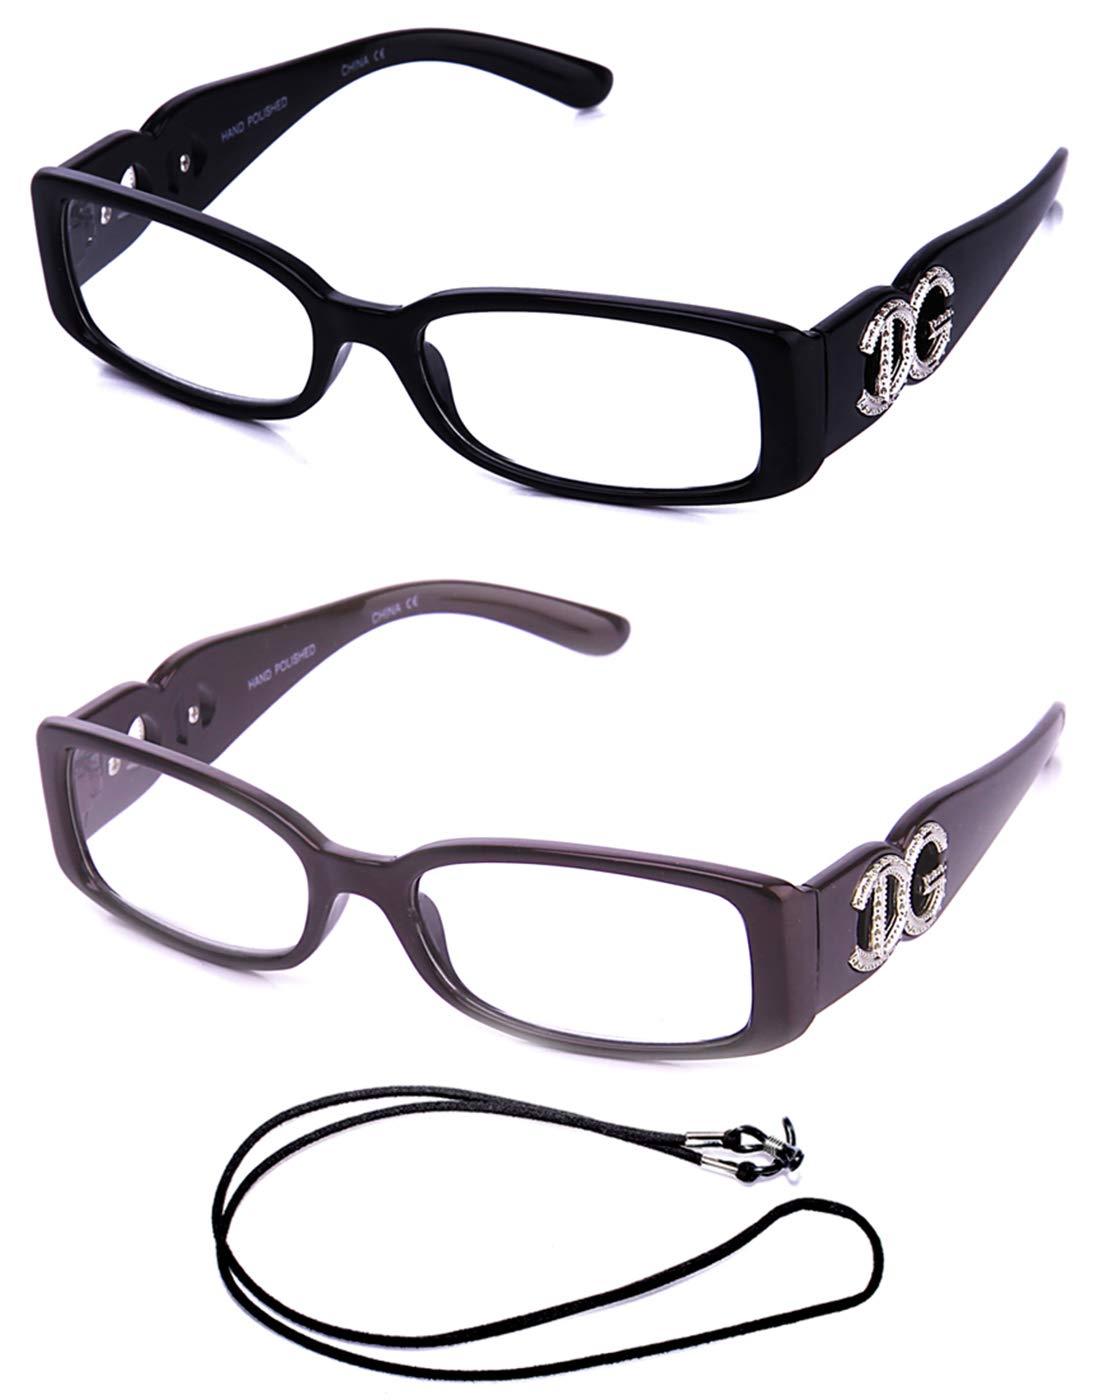 837da8775f11 Amazon.com  Newbee Fashion - Stylish Womens Fashion Reading Glasses Trendy  Small Frame Large IG Logo (2 Pairs with FREE Lanyard)  Health   Personal  Care